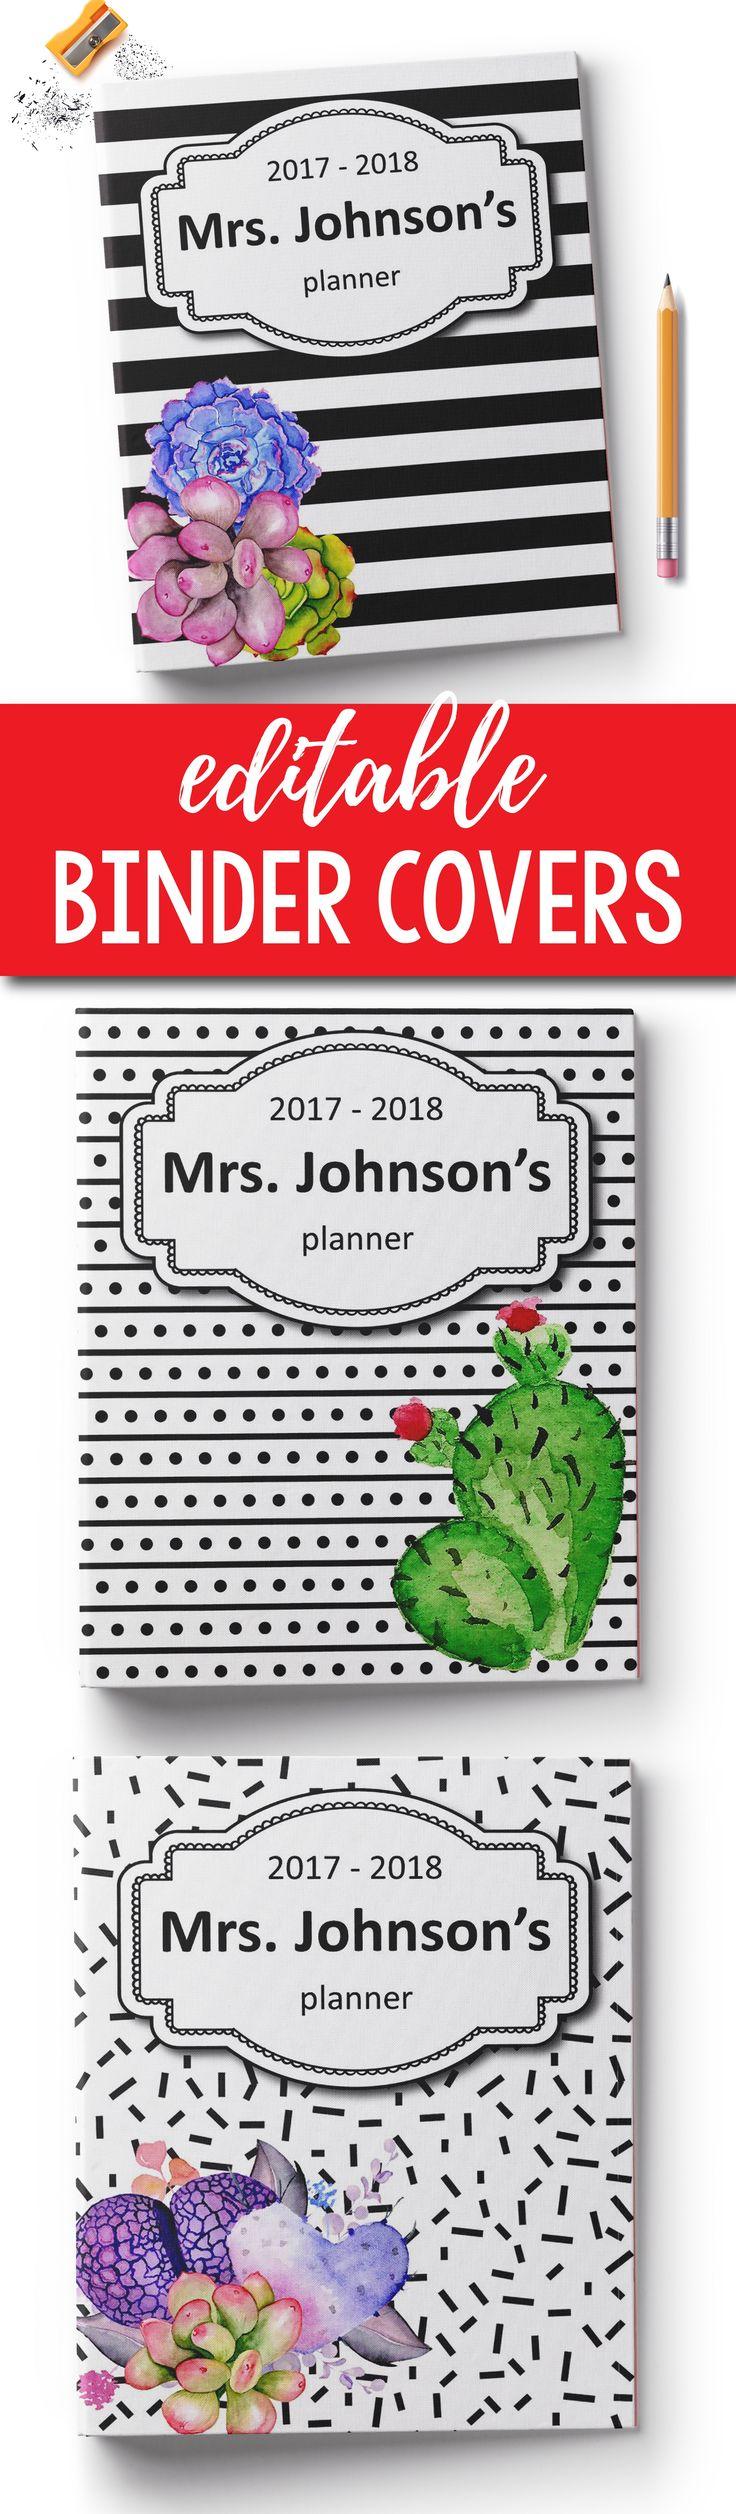 https://www.teacherspayteachers.com/Product/Succulent-Binder-Covers-and-Spines-EDITABLE-Succulent-Decor-3495882?utm_source=pinterest.com&utm_campaign=Succulent%20Binder%20Covers%202